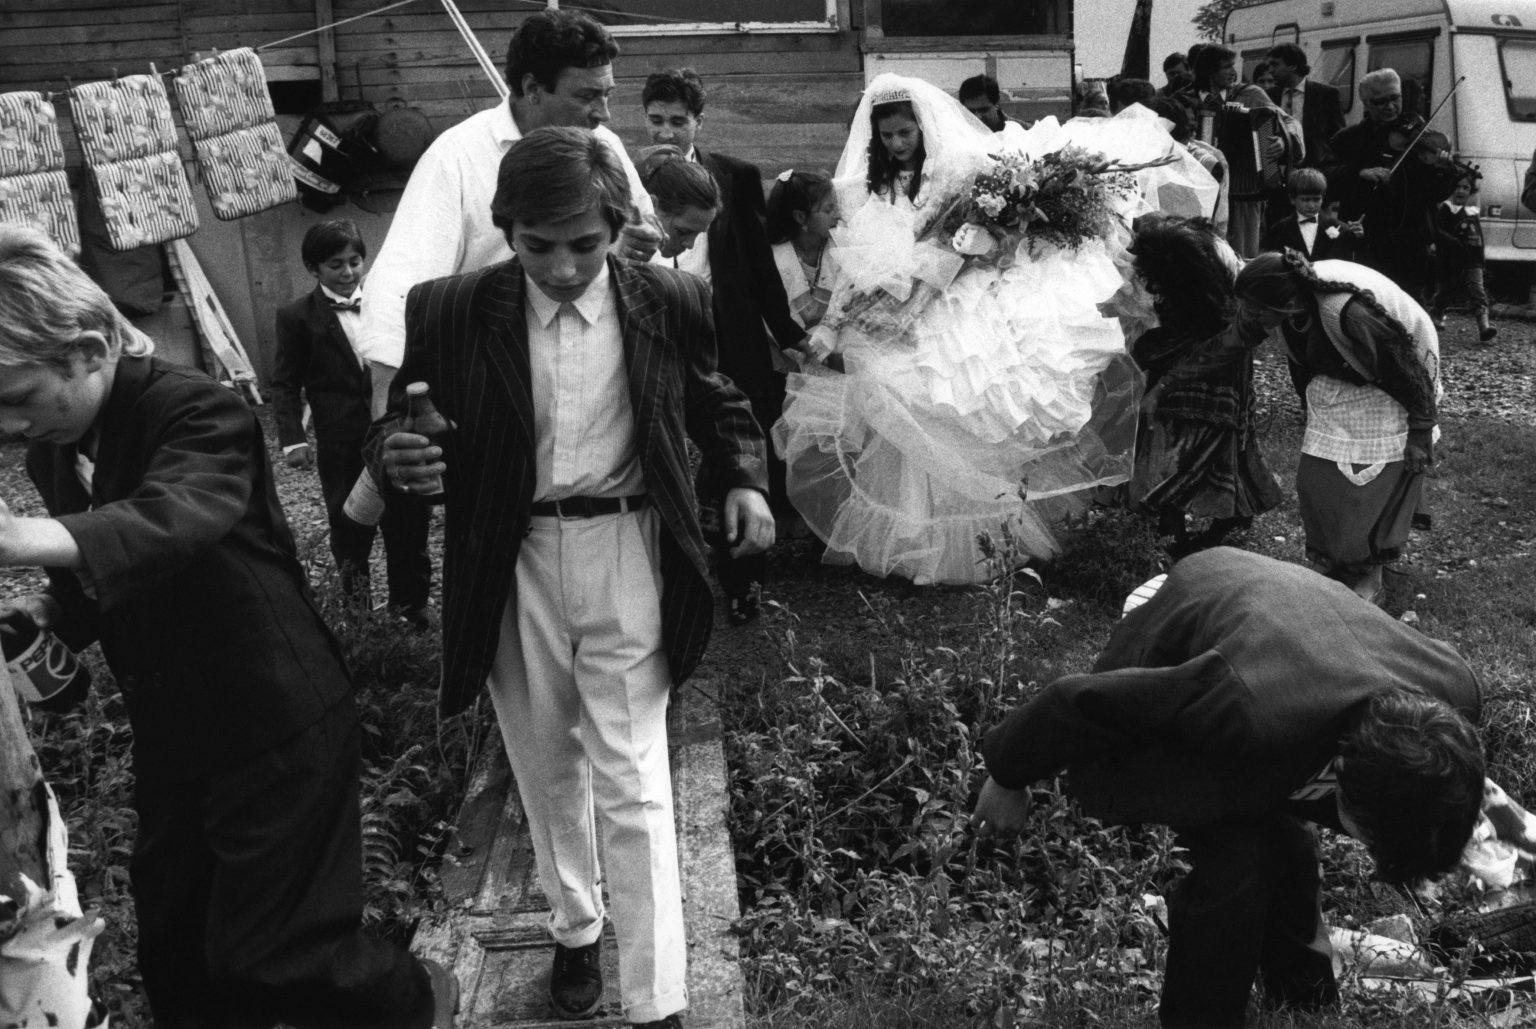 Florence , 1993 - Gypsy wedding >< Firenze , 1993 - Matrimonio zingaro